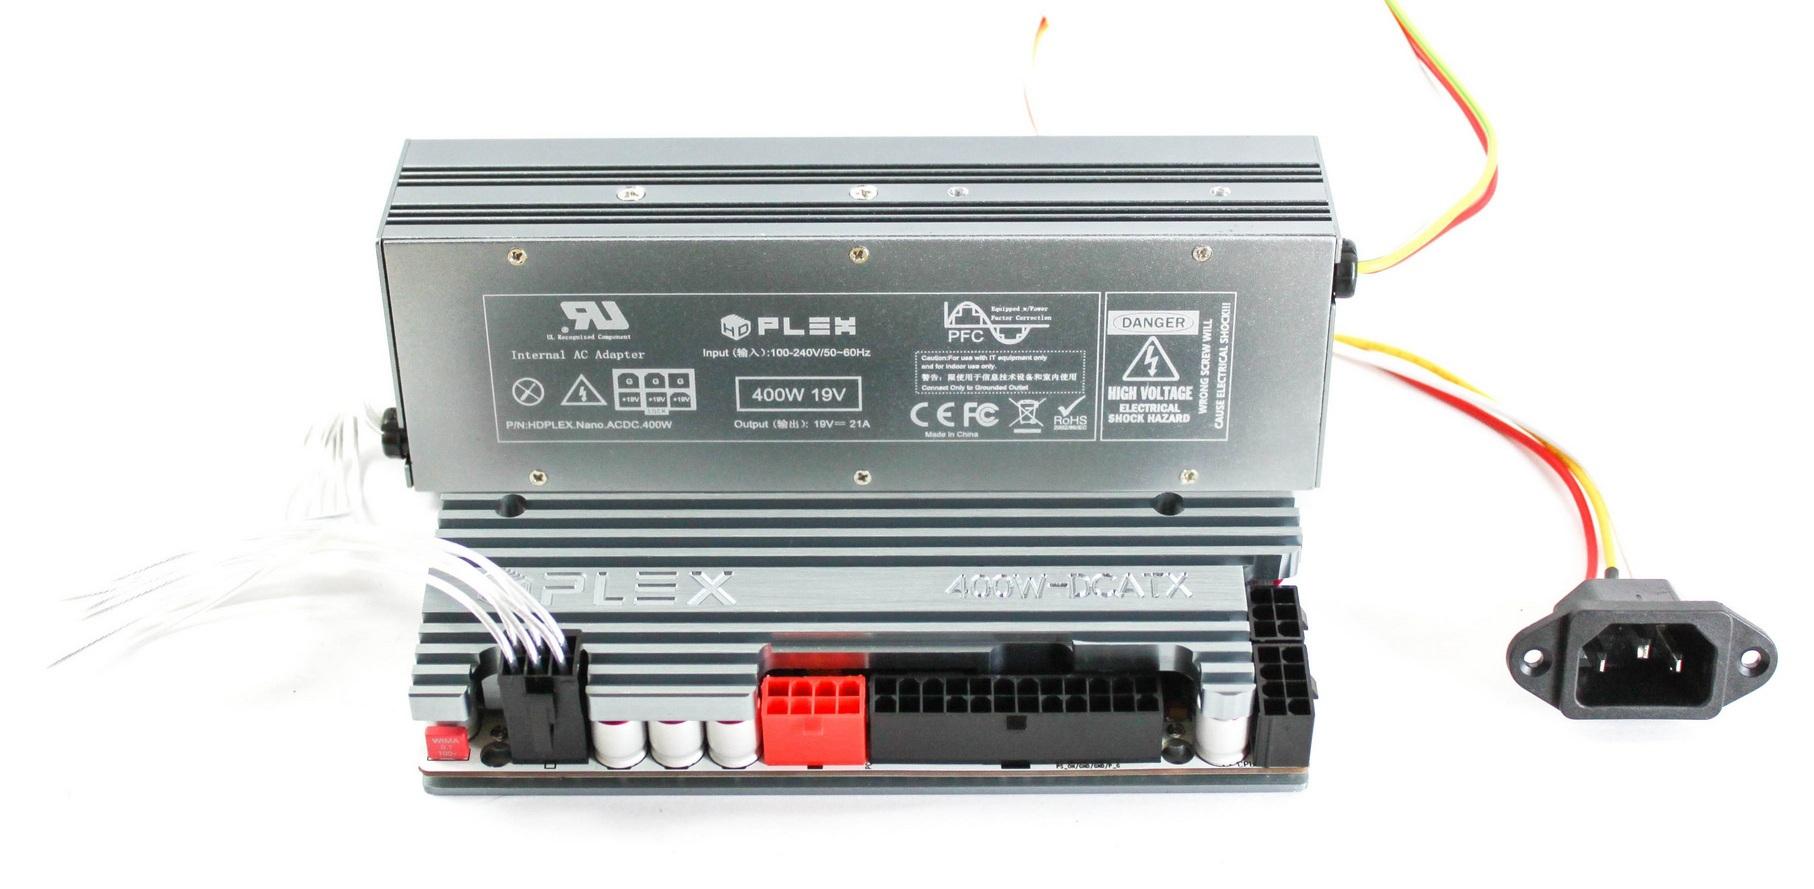 HDPLEX 400W NanoATX Combo